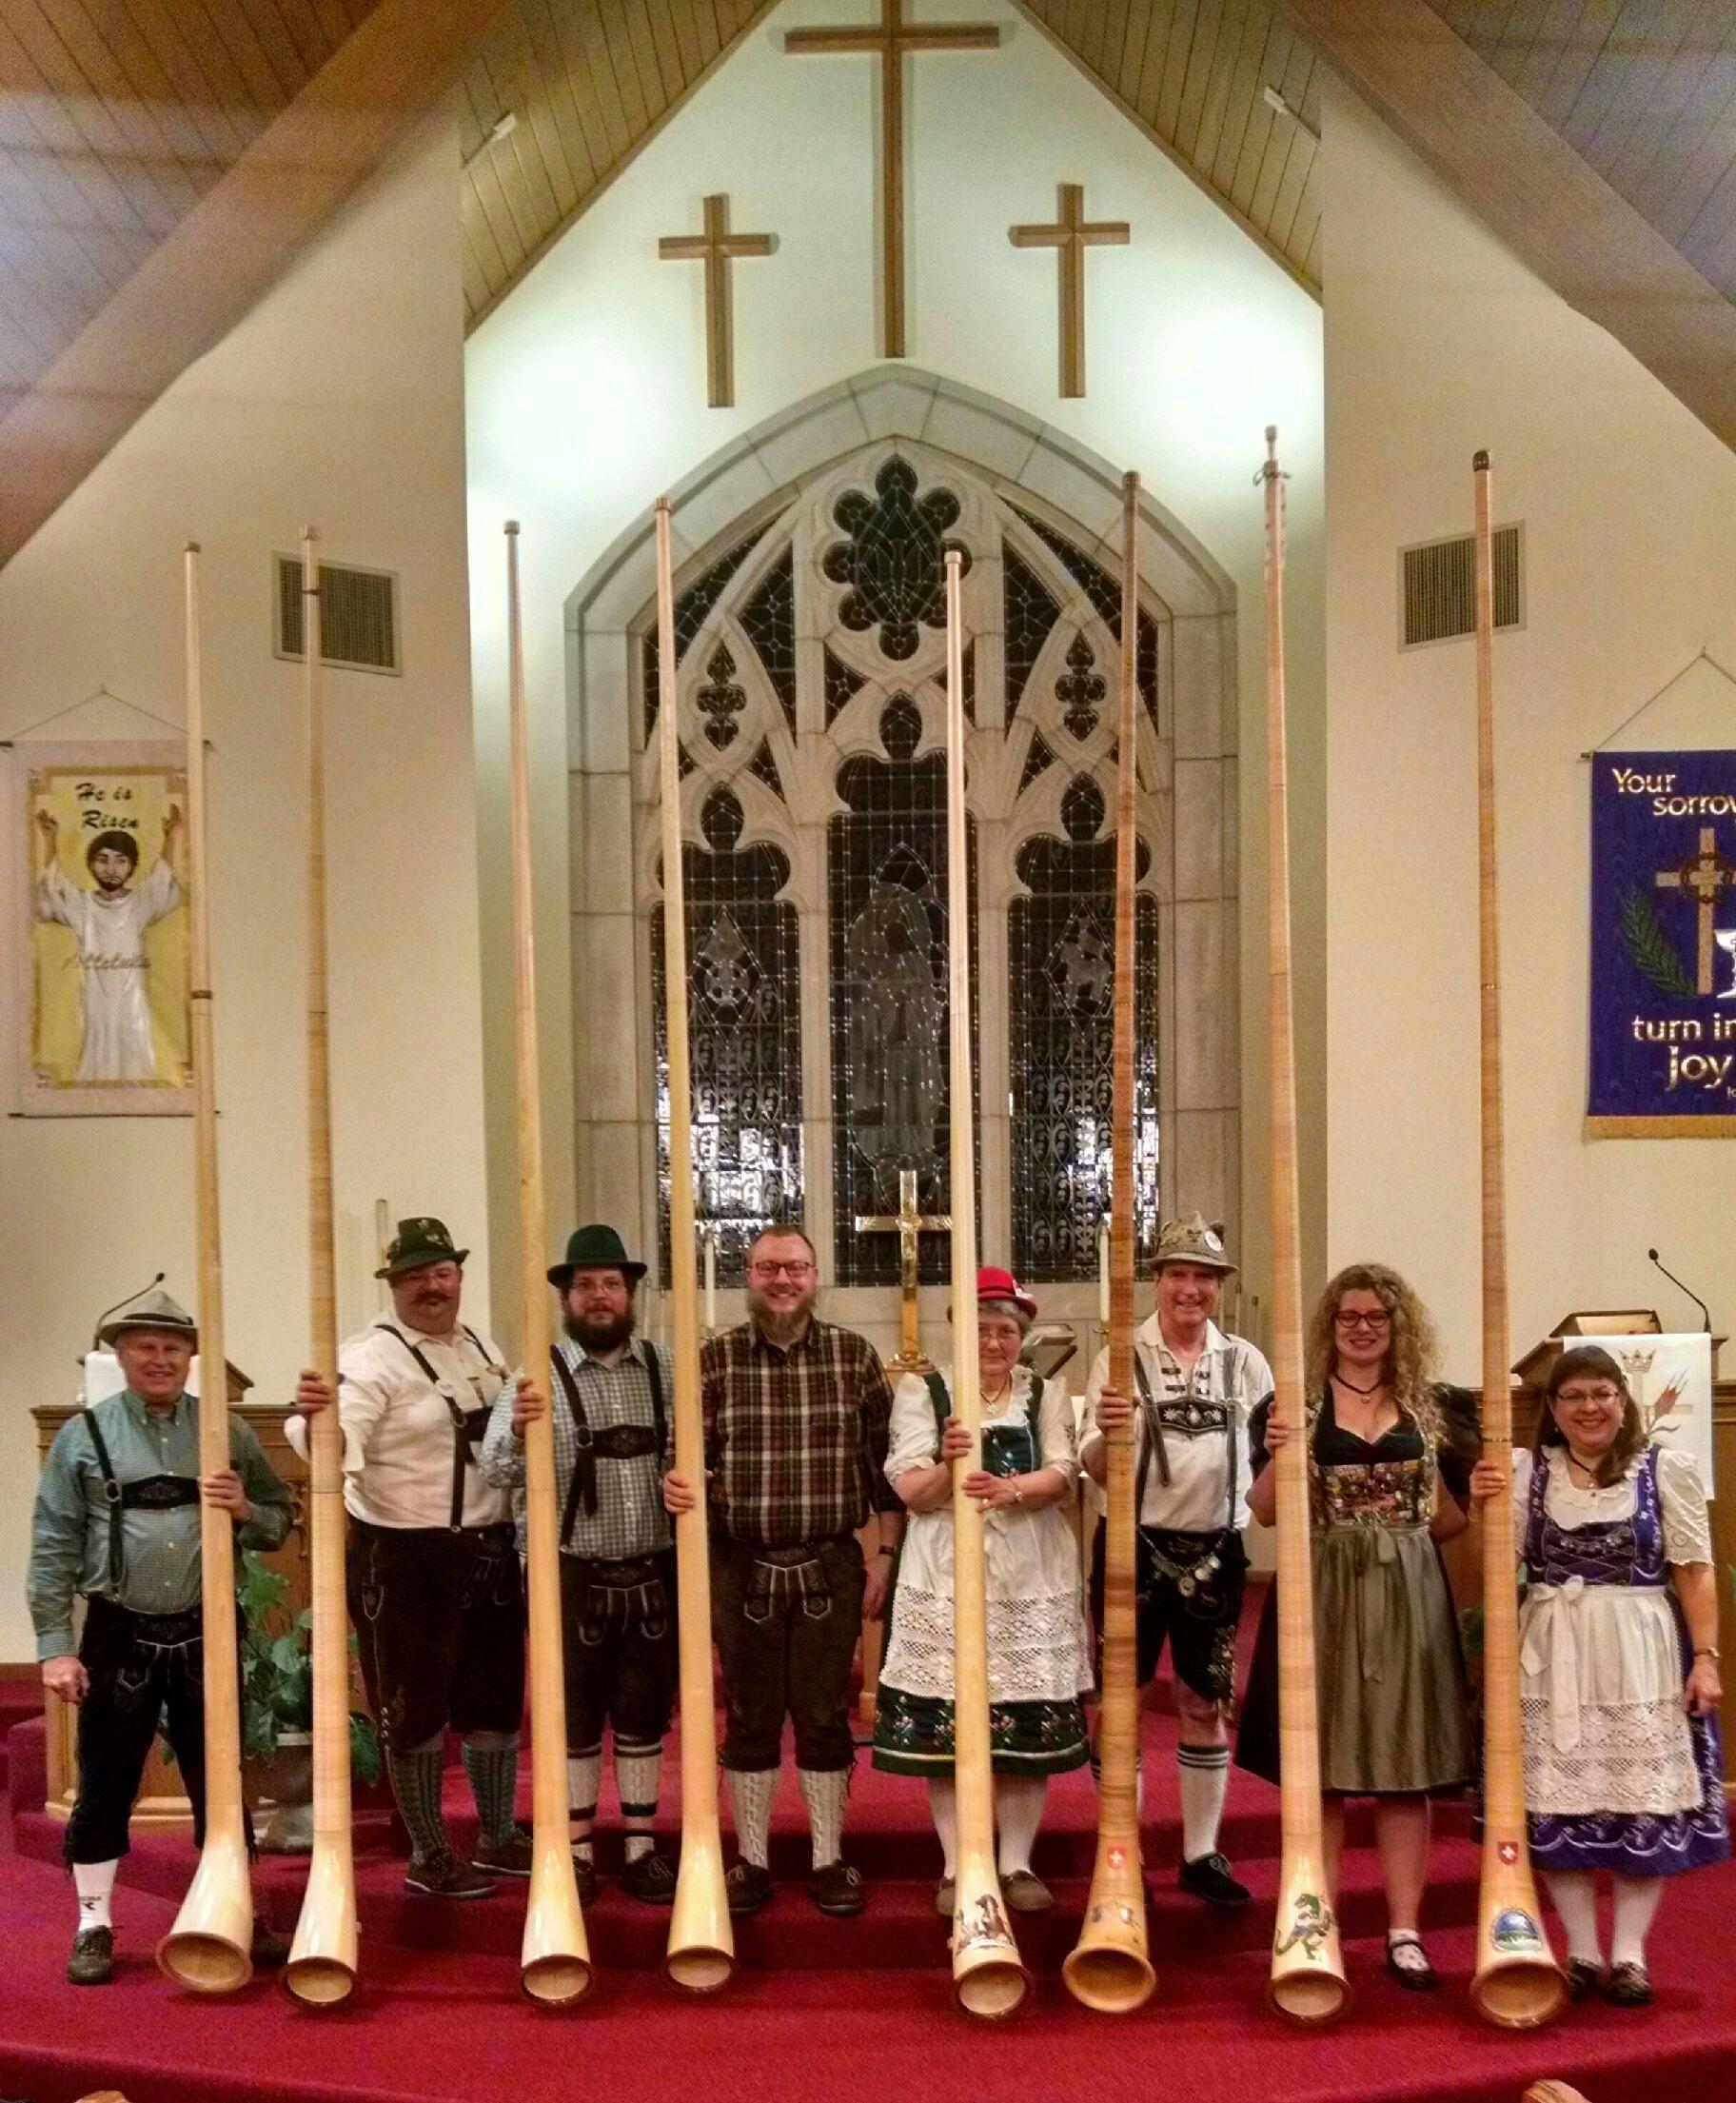 Alpine Echoes to Perform at Waelderhaus on June